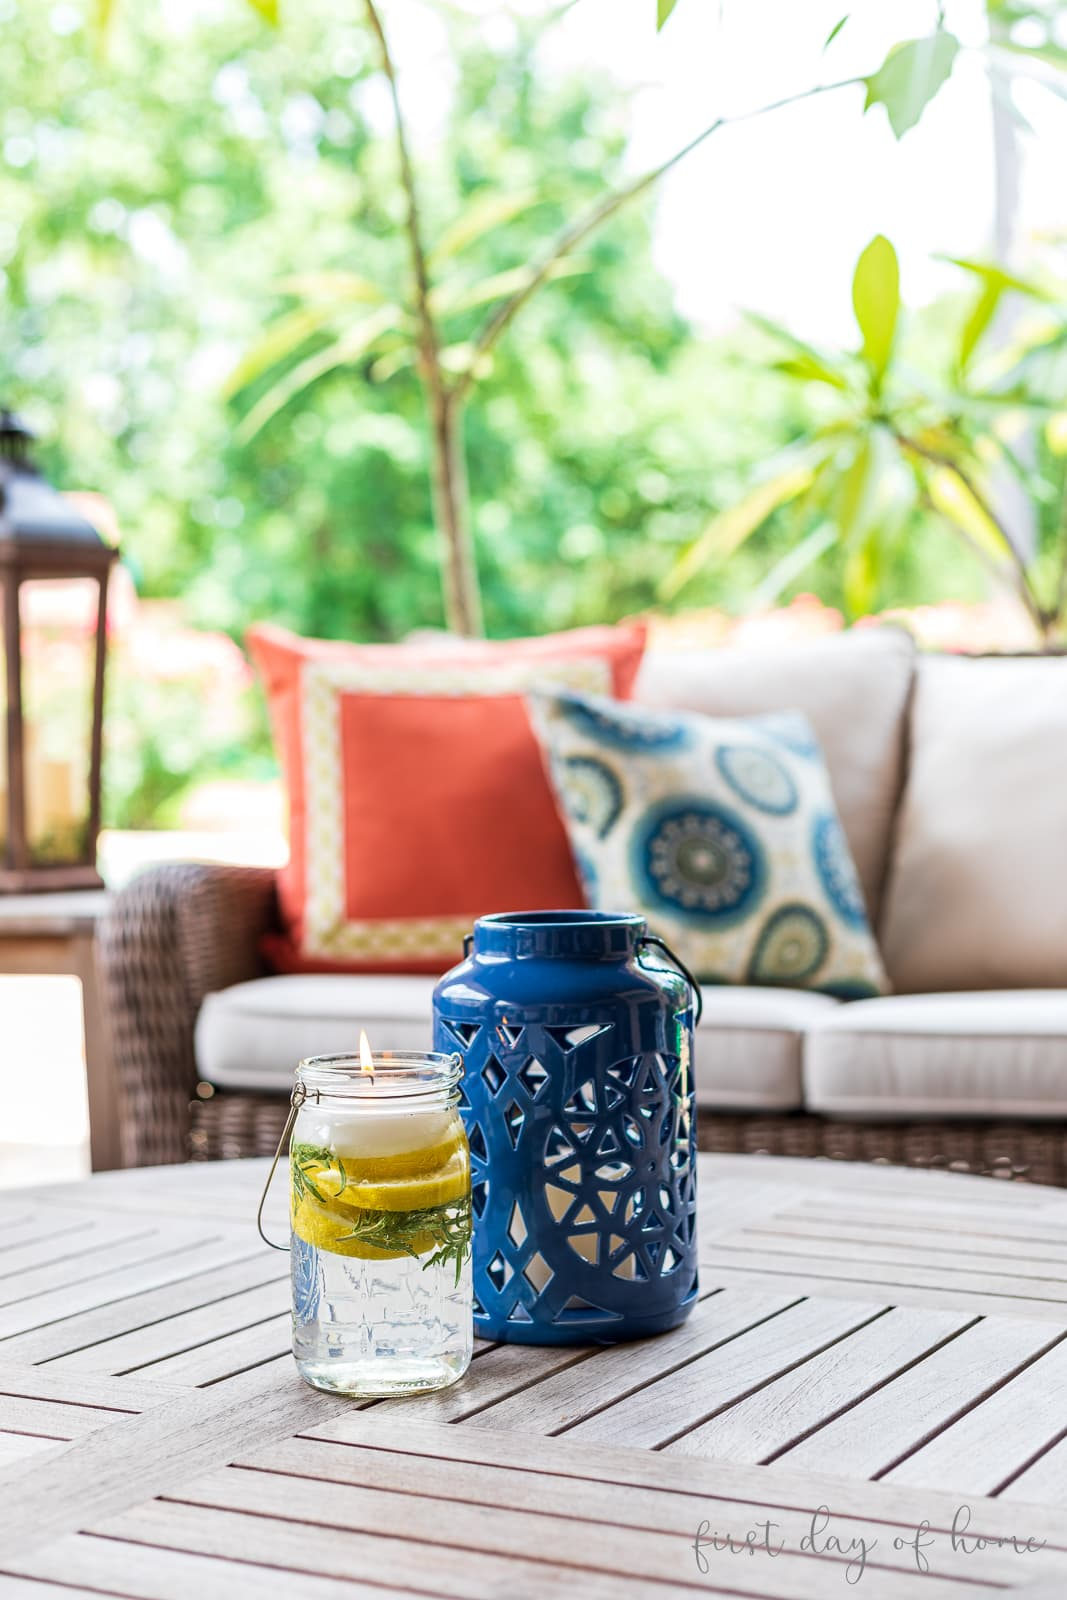 Mason jar luminary and lantern on outdoor patio table